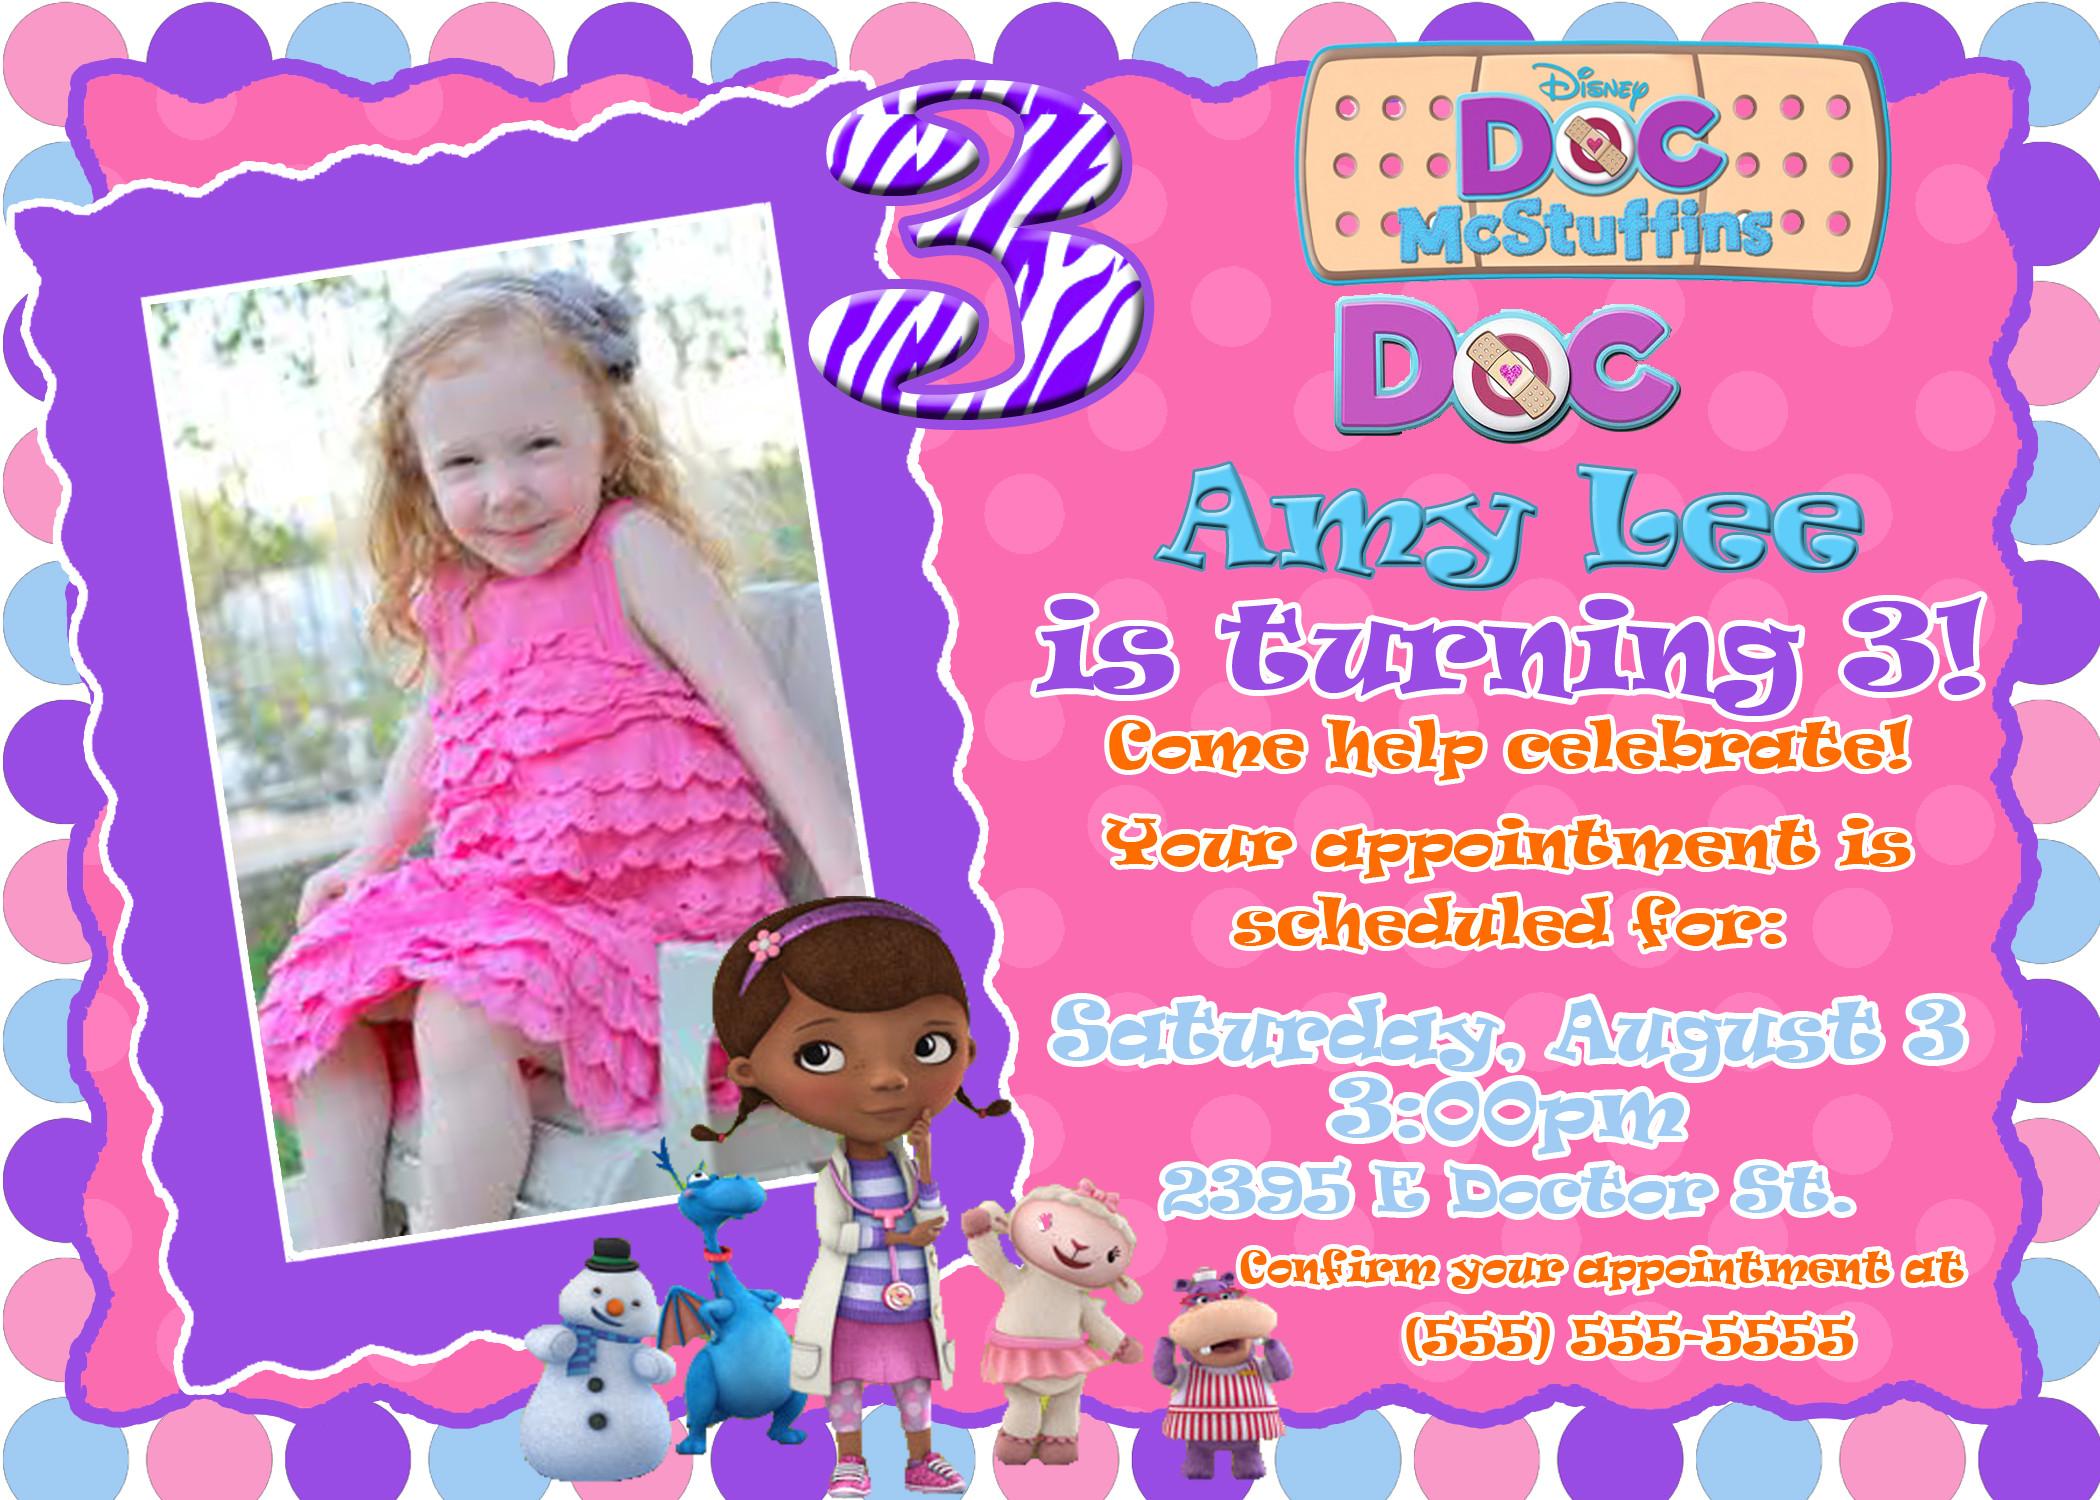 Best ideas about Doc Mcstuffins Birthday Invitations . Save or Pin Doc McStuffin's Birthday Invitation Now.